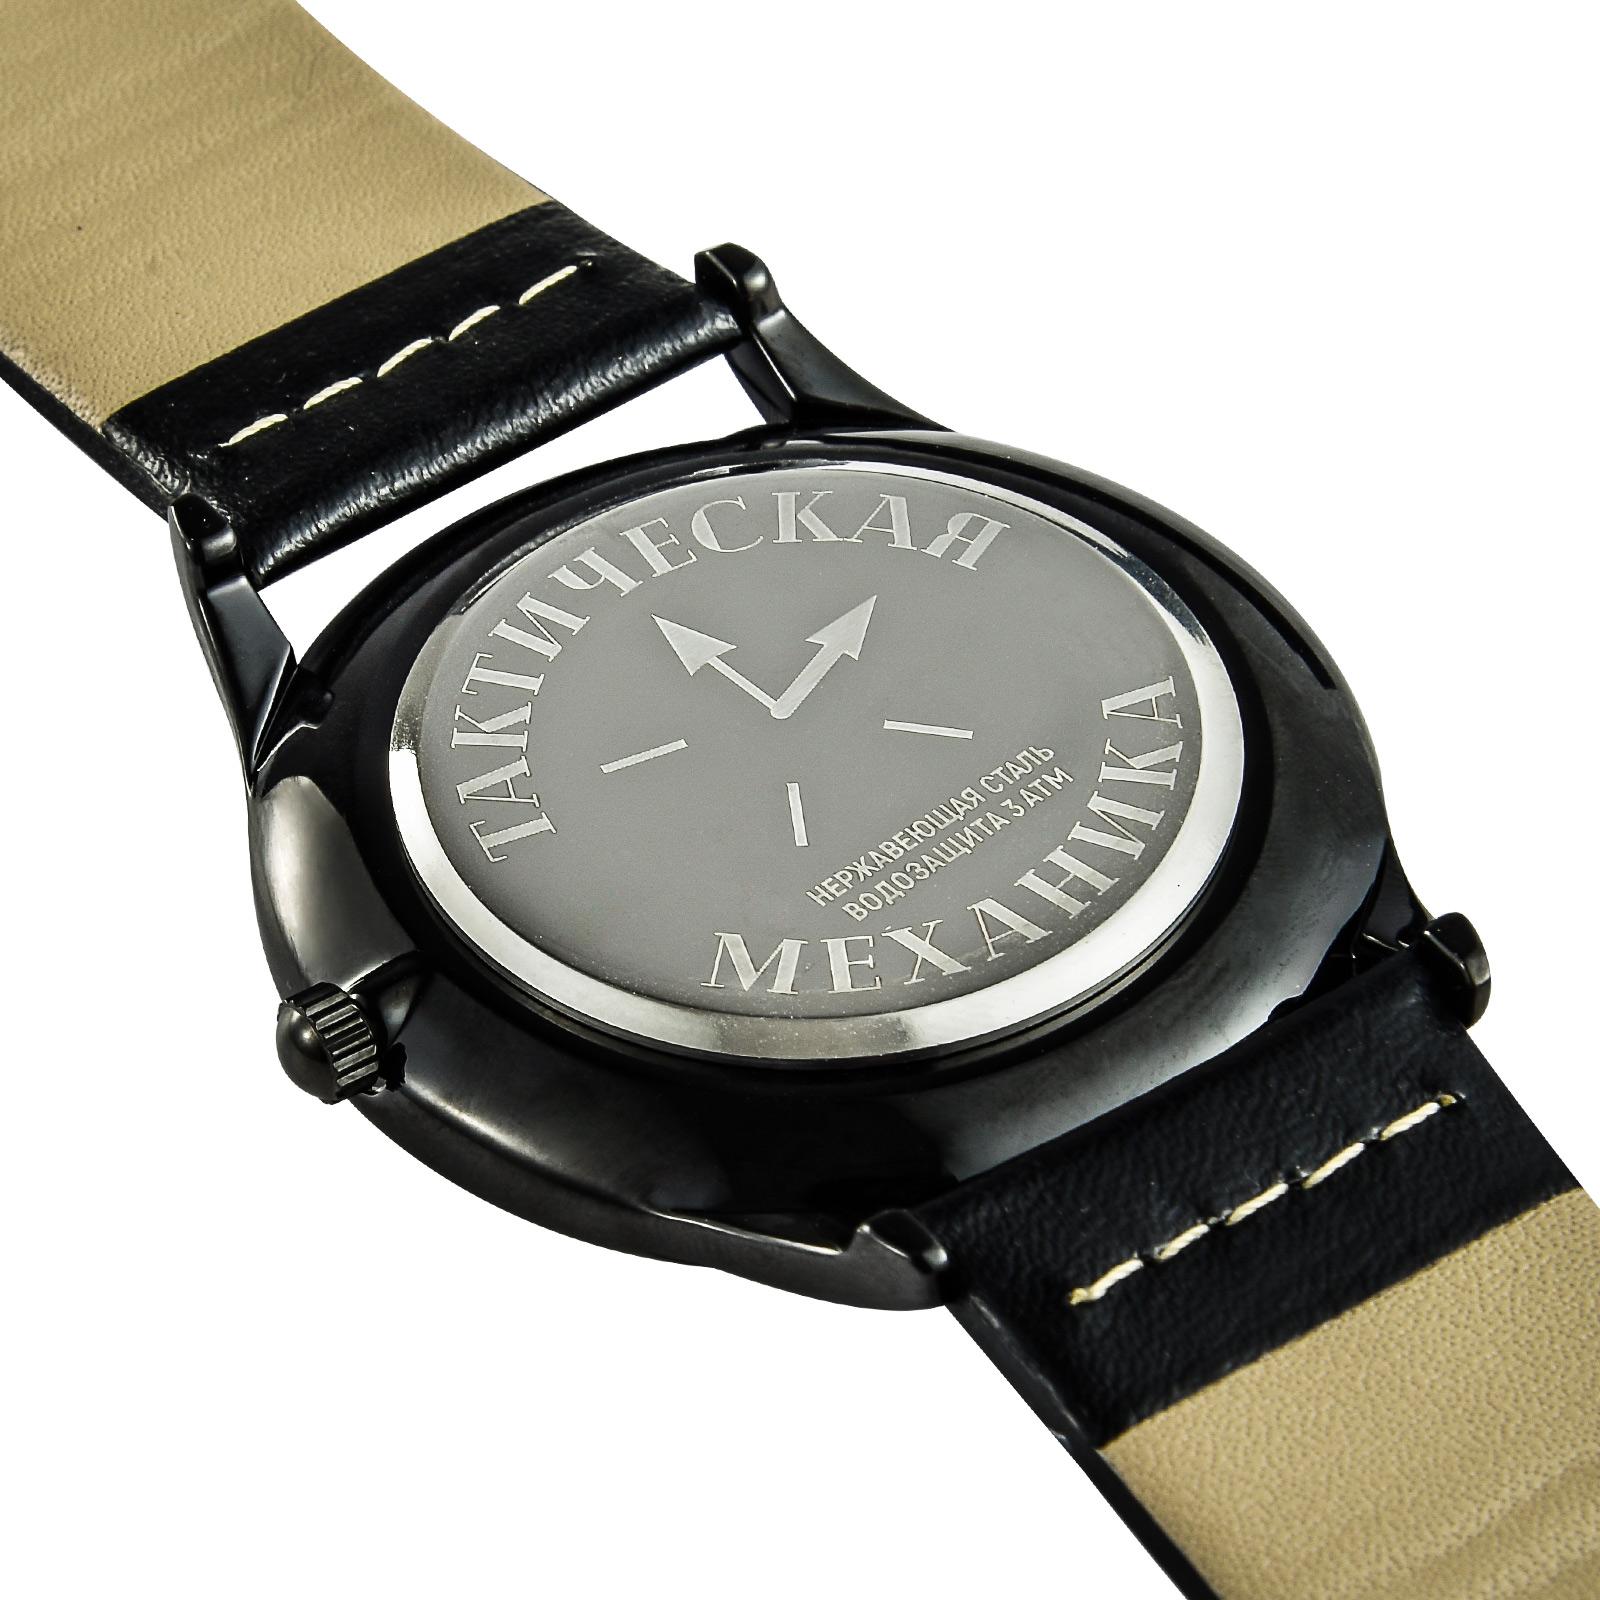 Мужские командирские часы Морская пехота